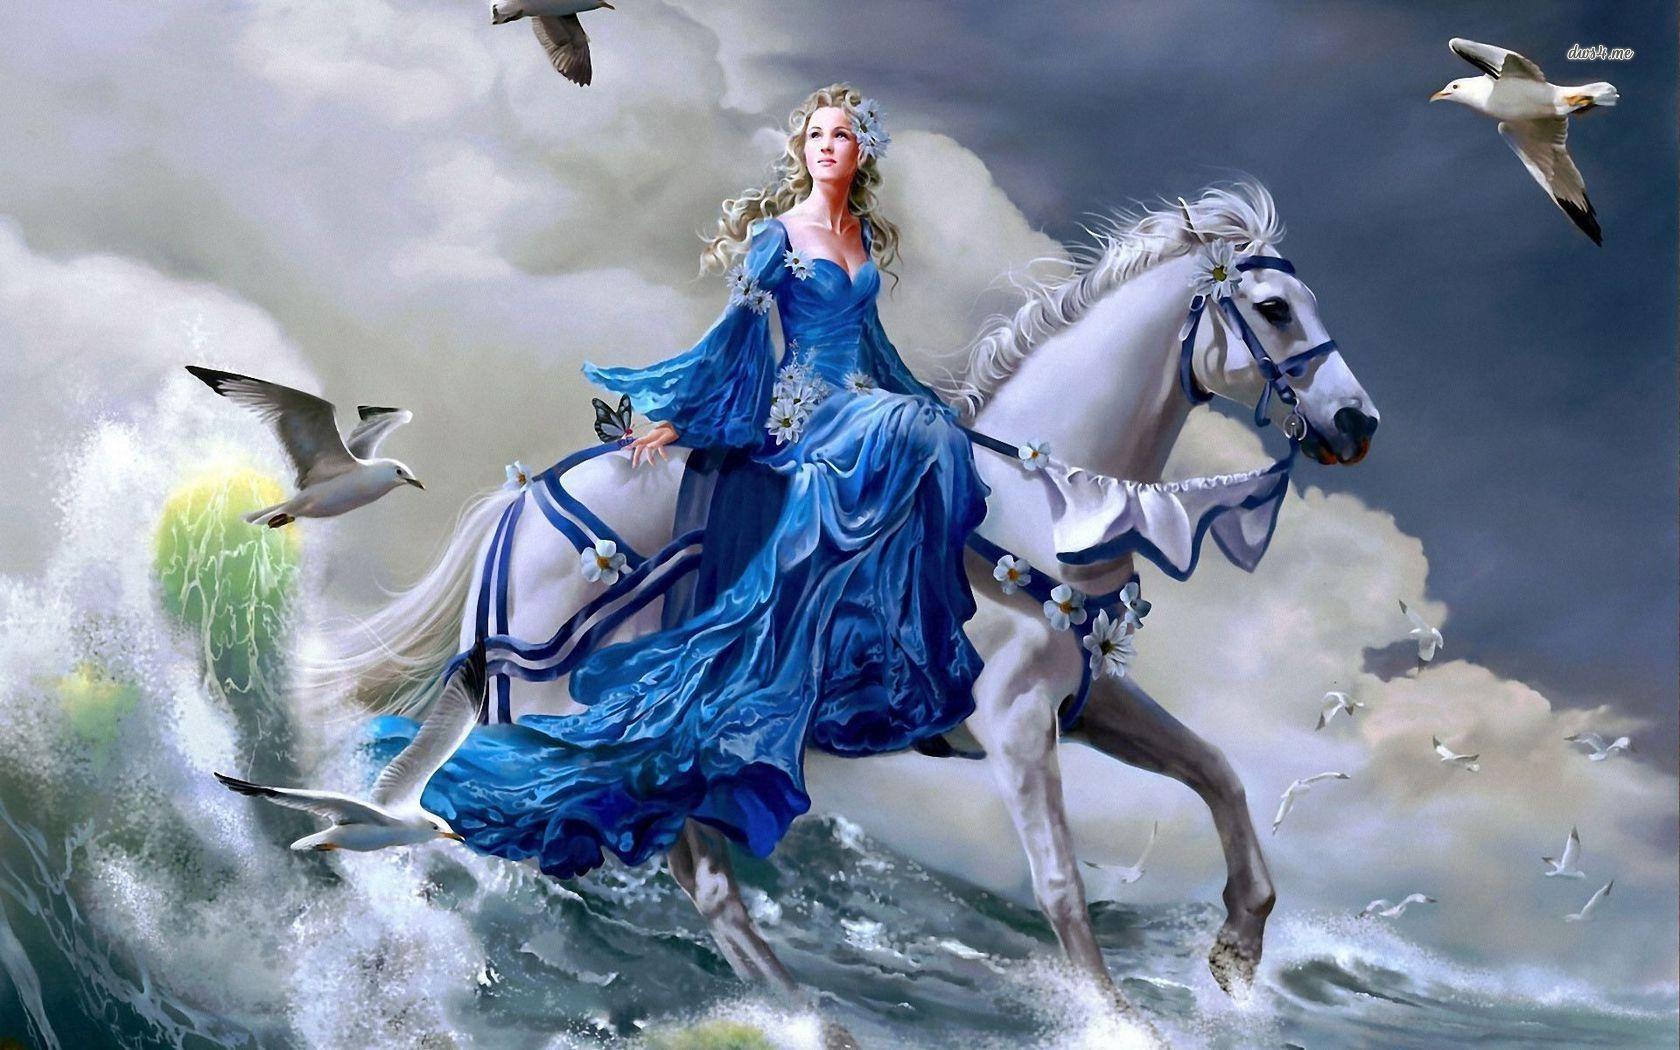 Most Inspiring Wallpaper Horse Fantasy - c4bb7cda265ab884a798565391fdd798  Collection_715079.jpg